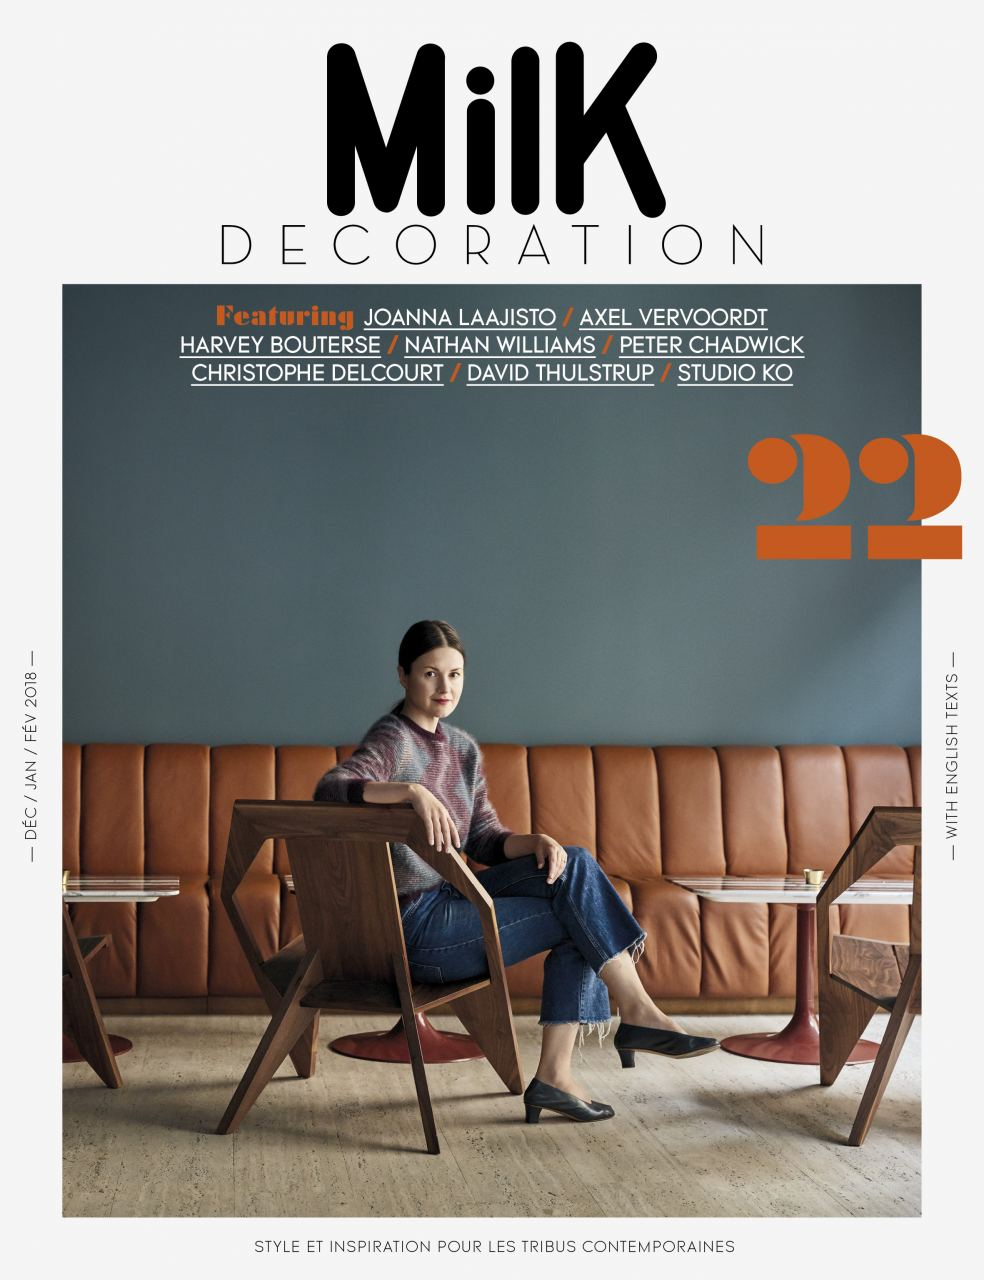 Milk Decoration #22